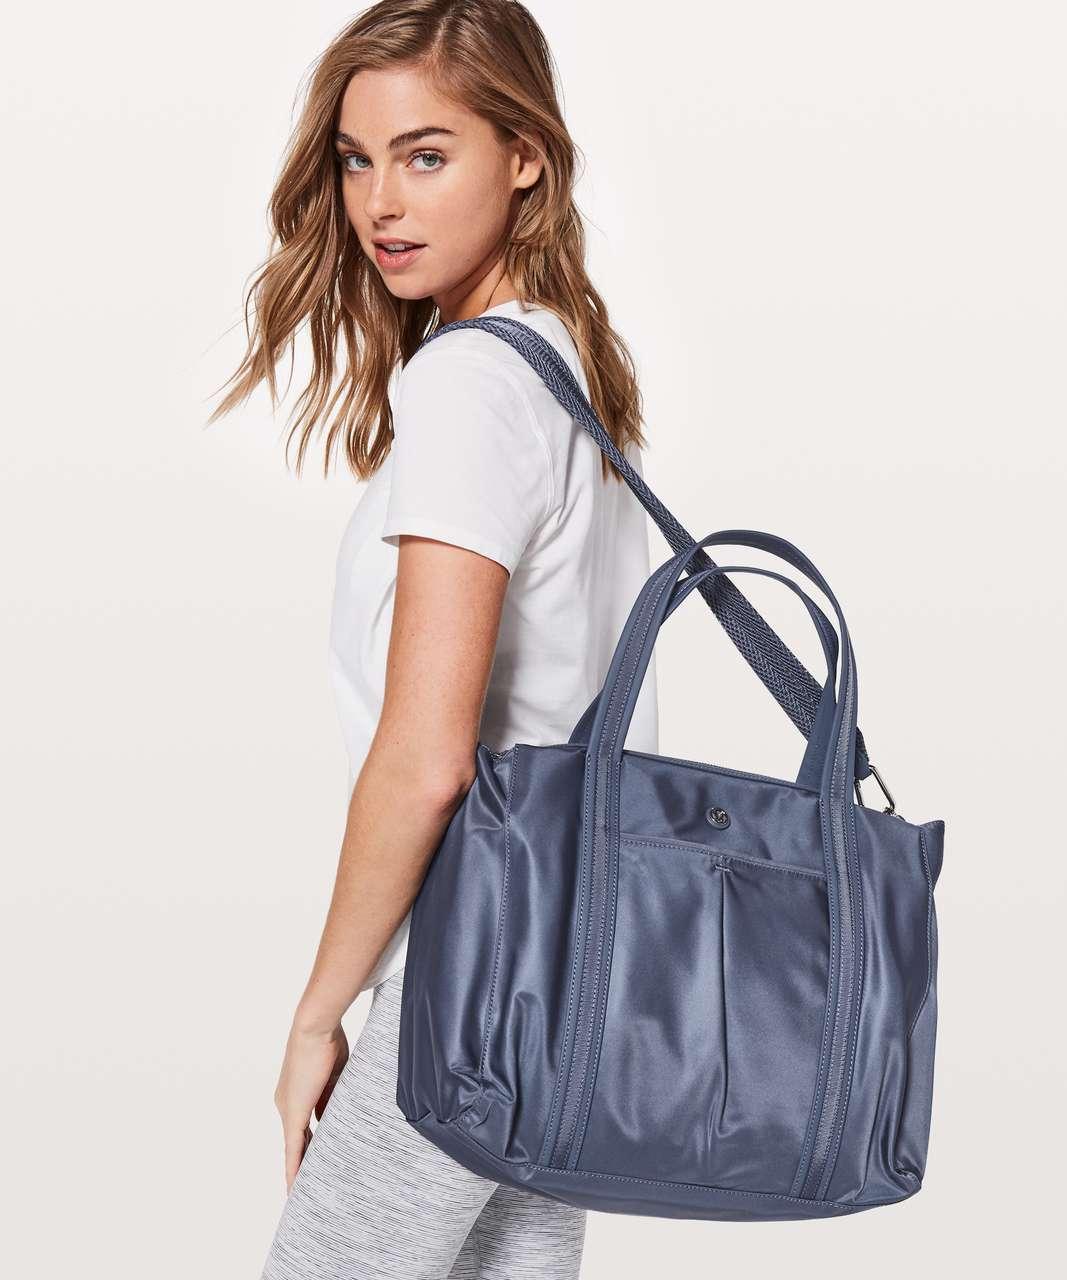 Lululemon Everywhere Bag *23L - Shade